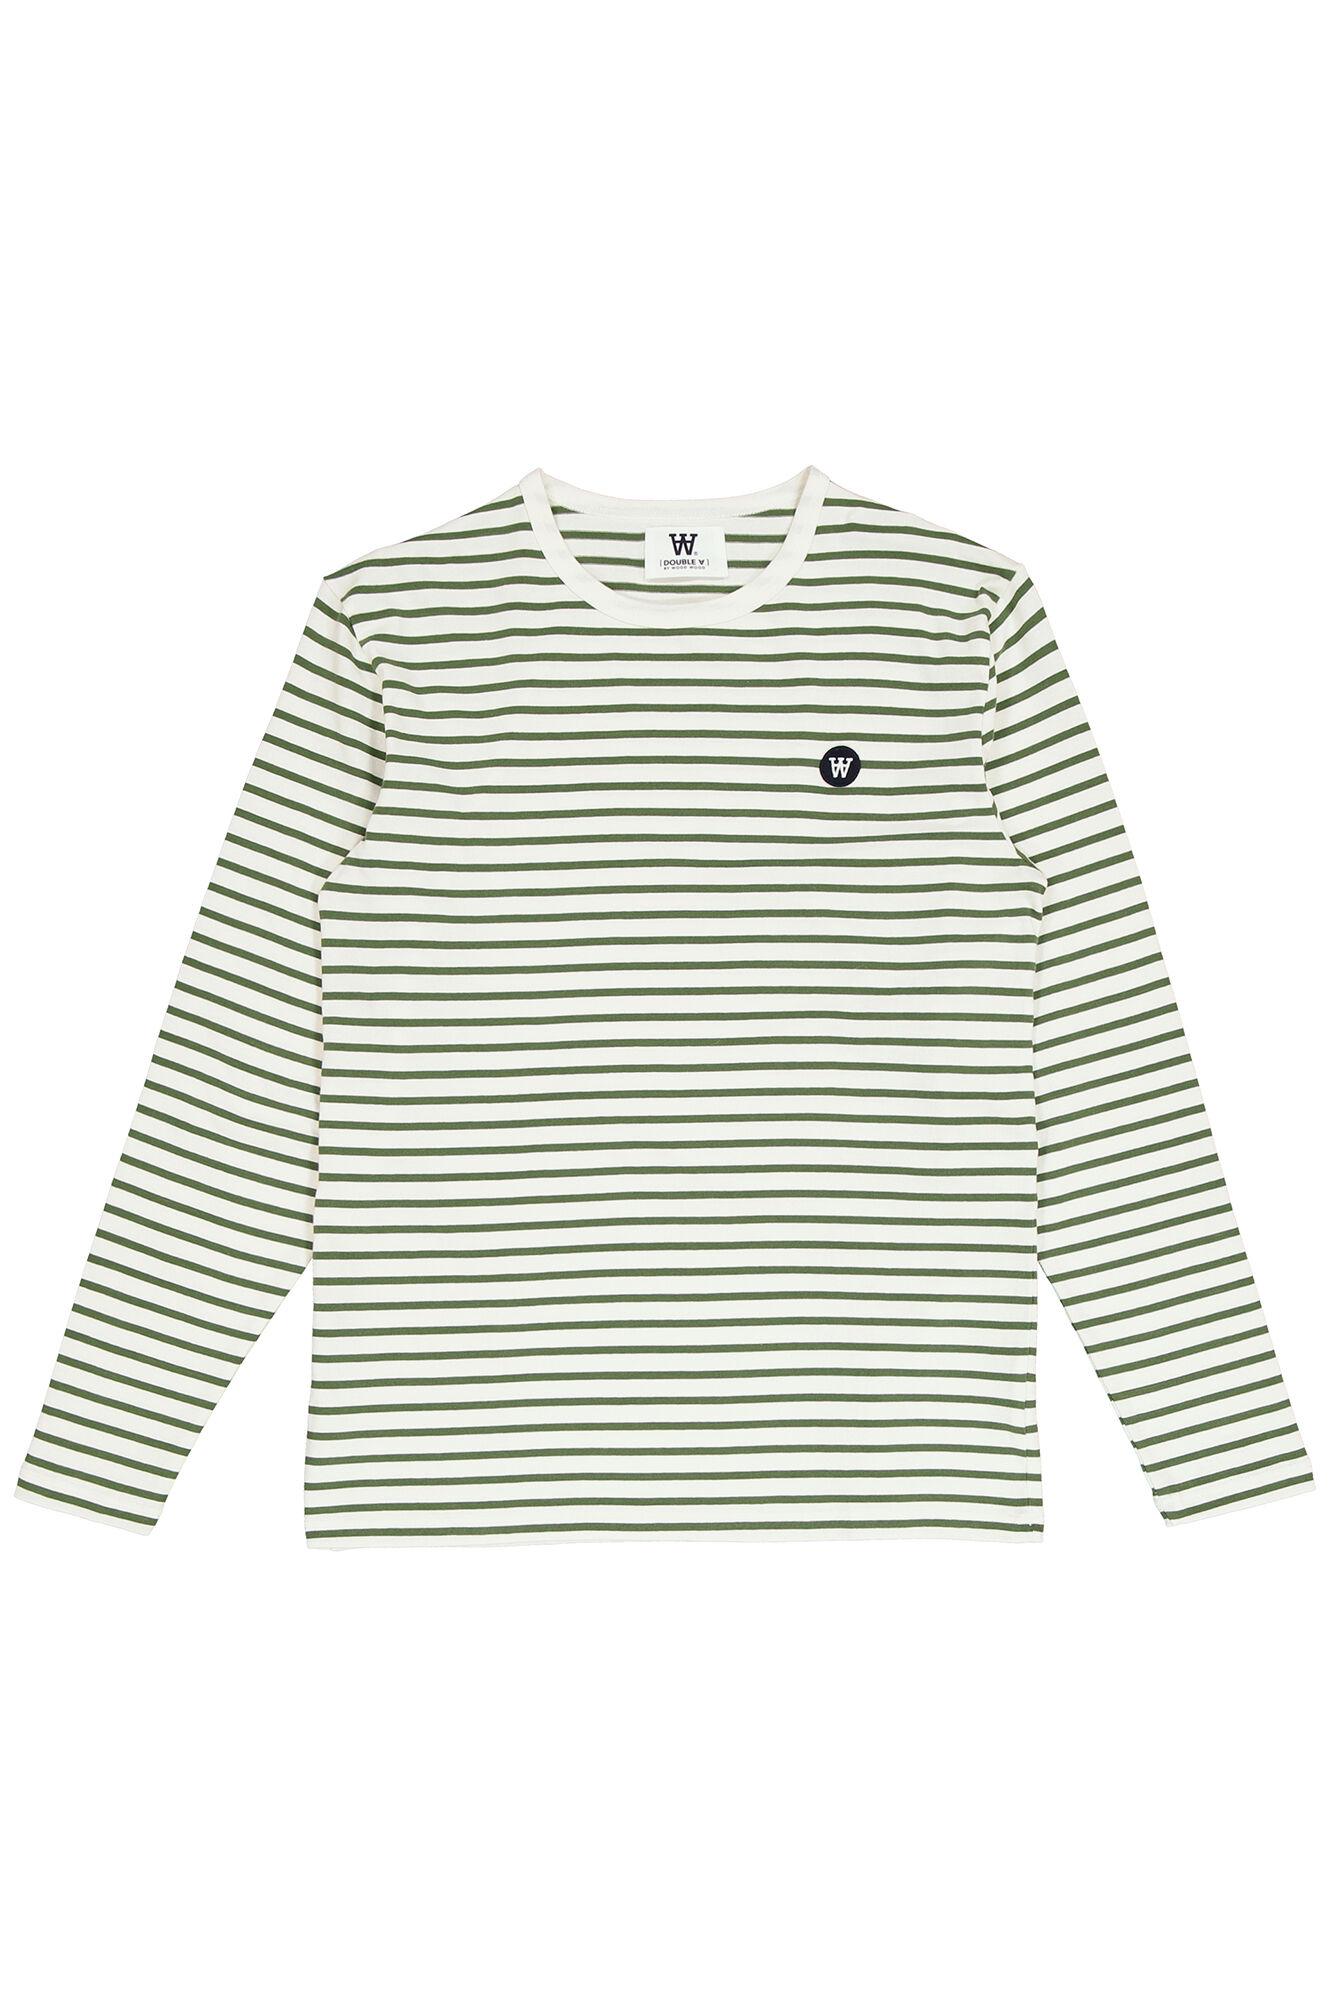 Mel long sleeve 10915404-2323, OFF-WHITE/GREEN STRIPES